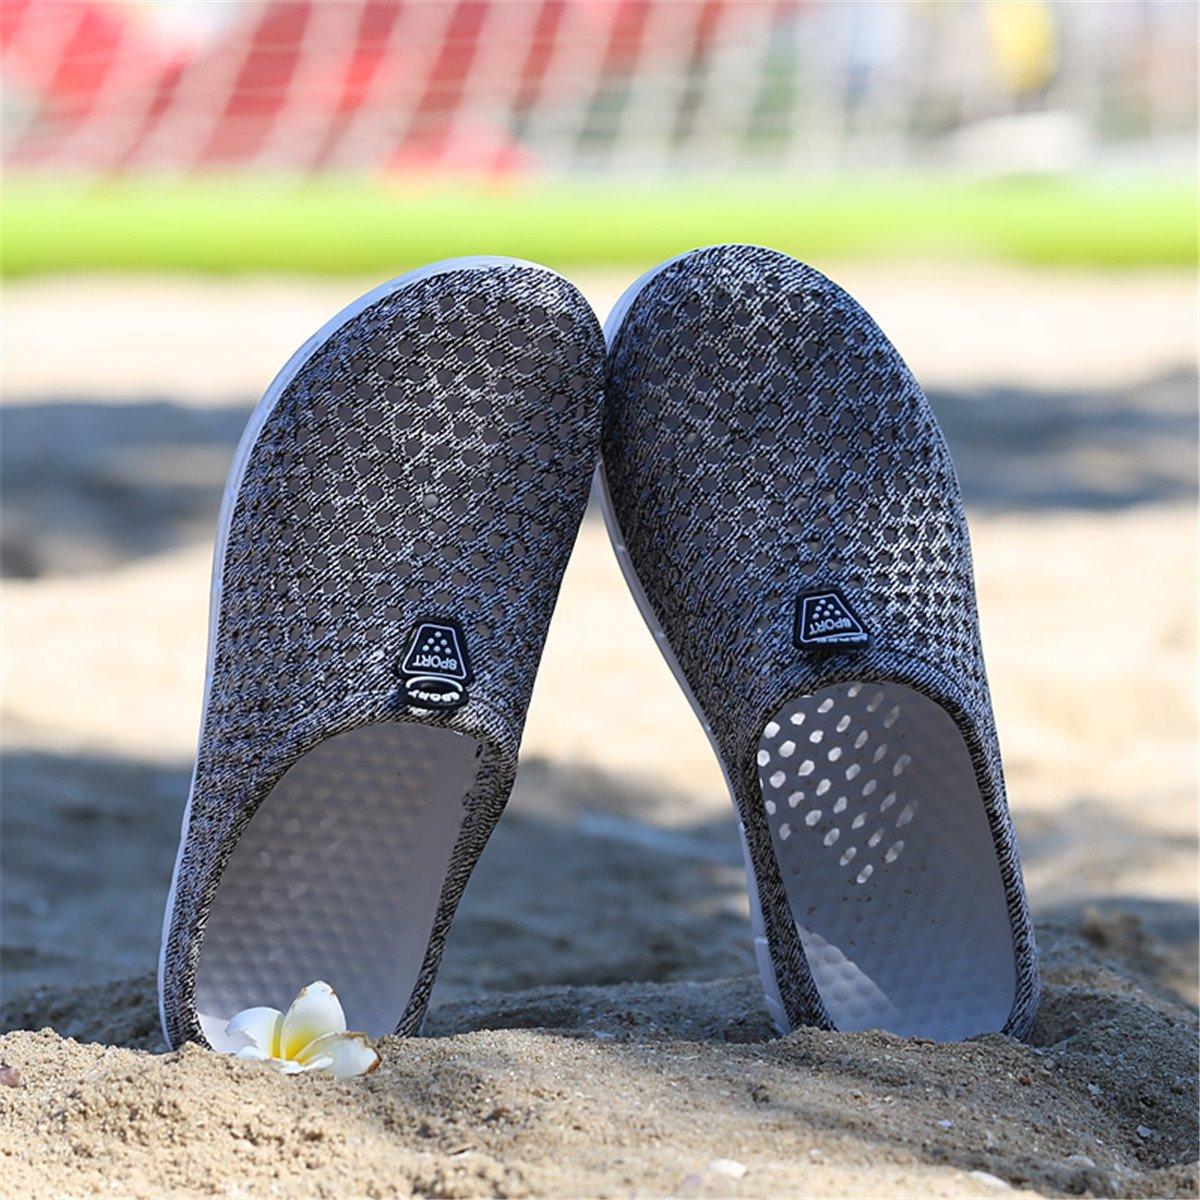 Ginjang Women's Garden Clogs Shoes Slip-on Slippers Sandals(38/Gray) by Ginjang (Image #5)